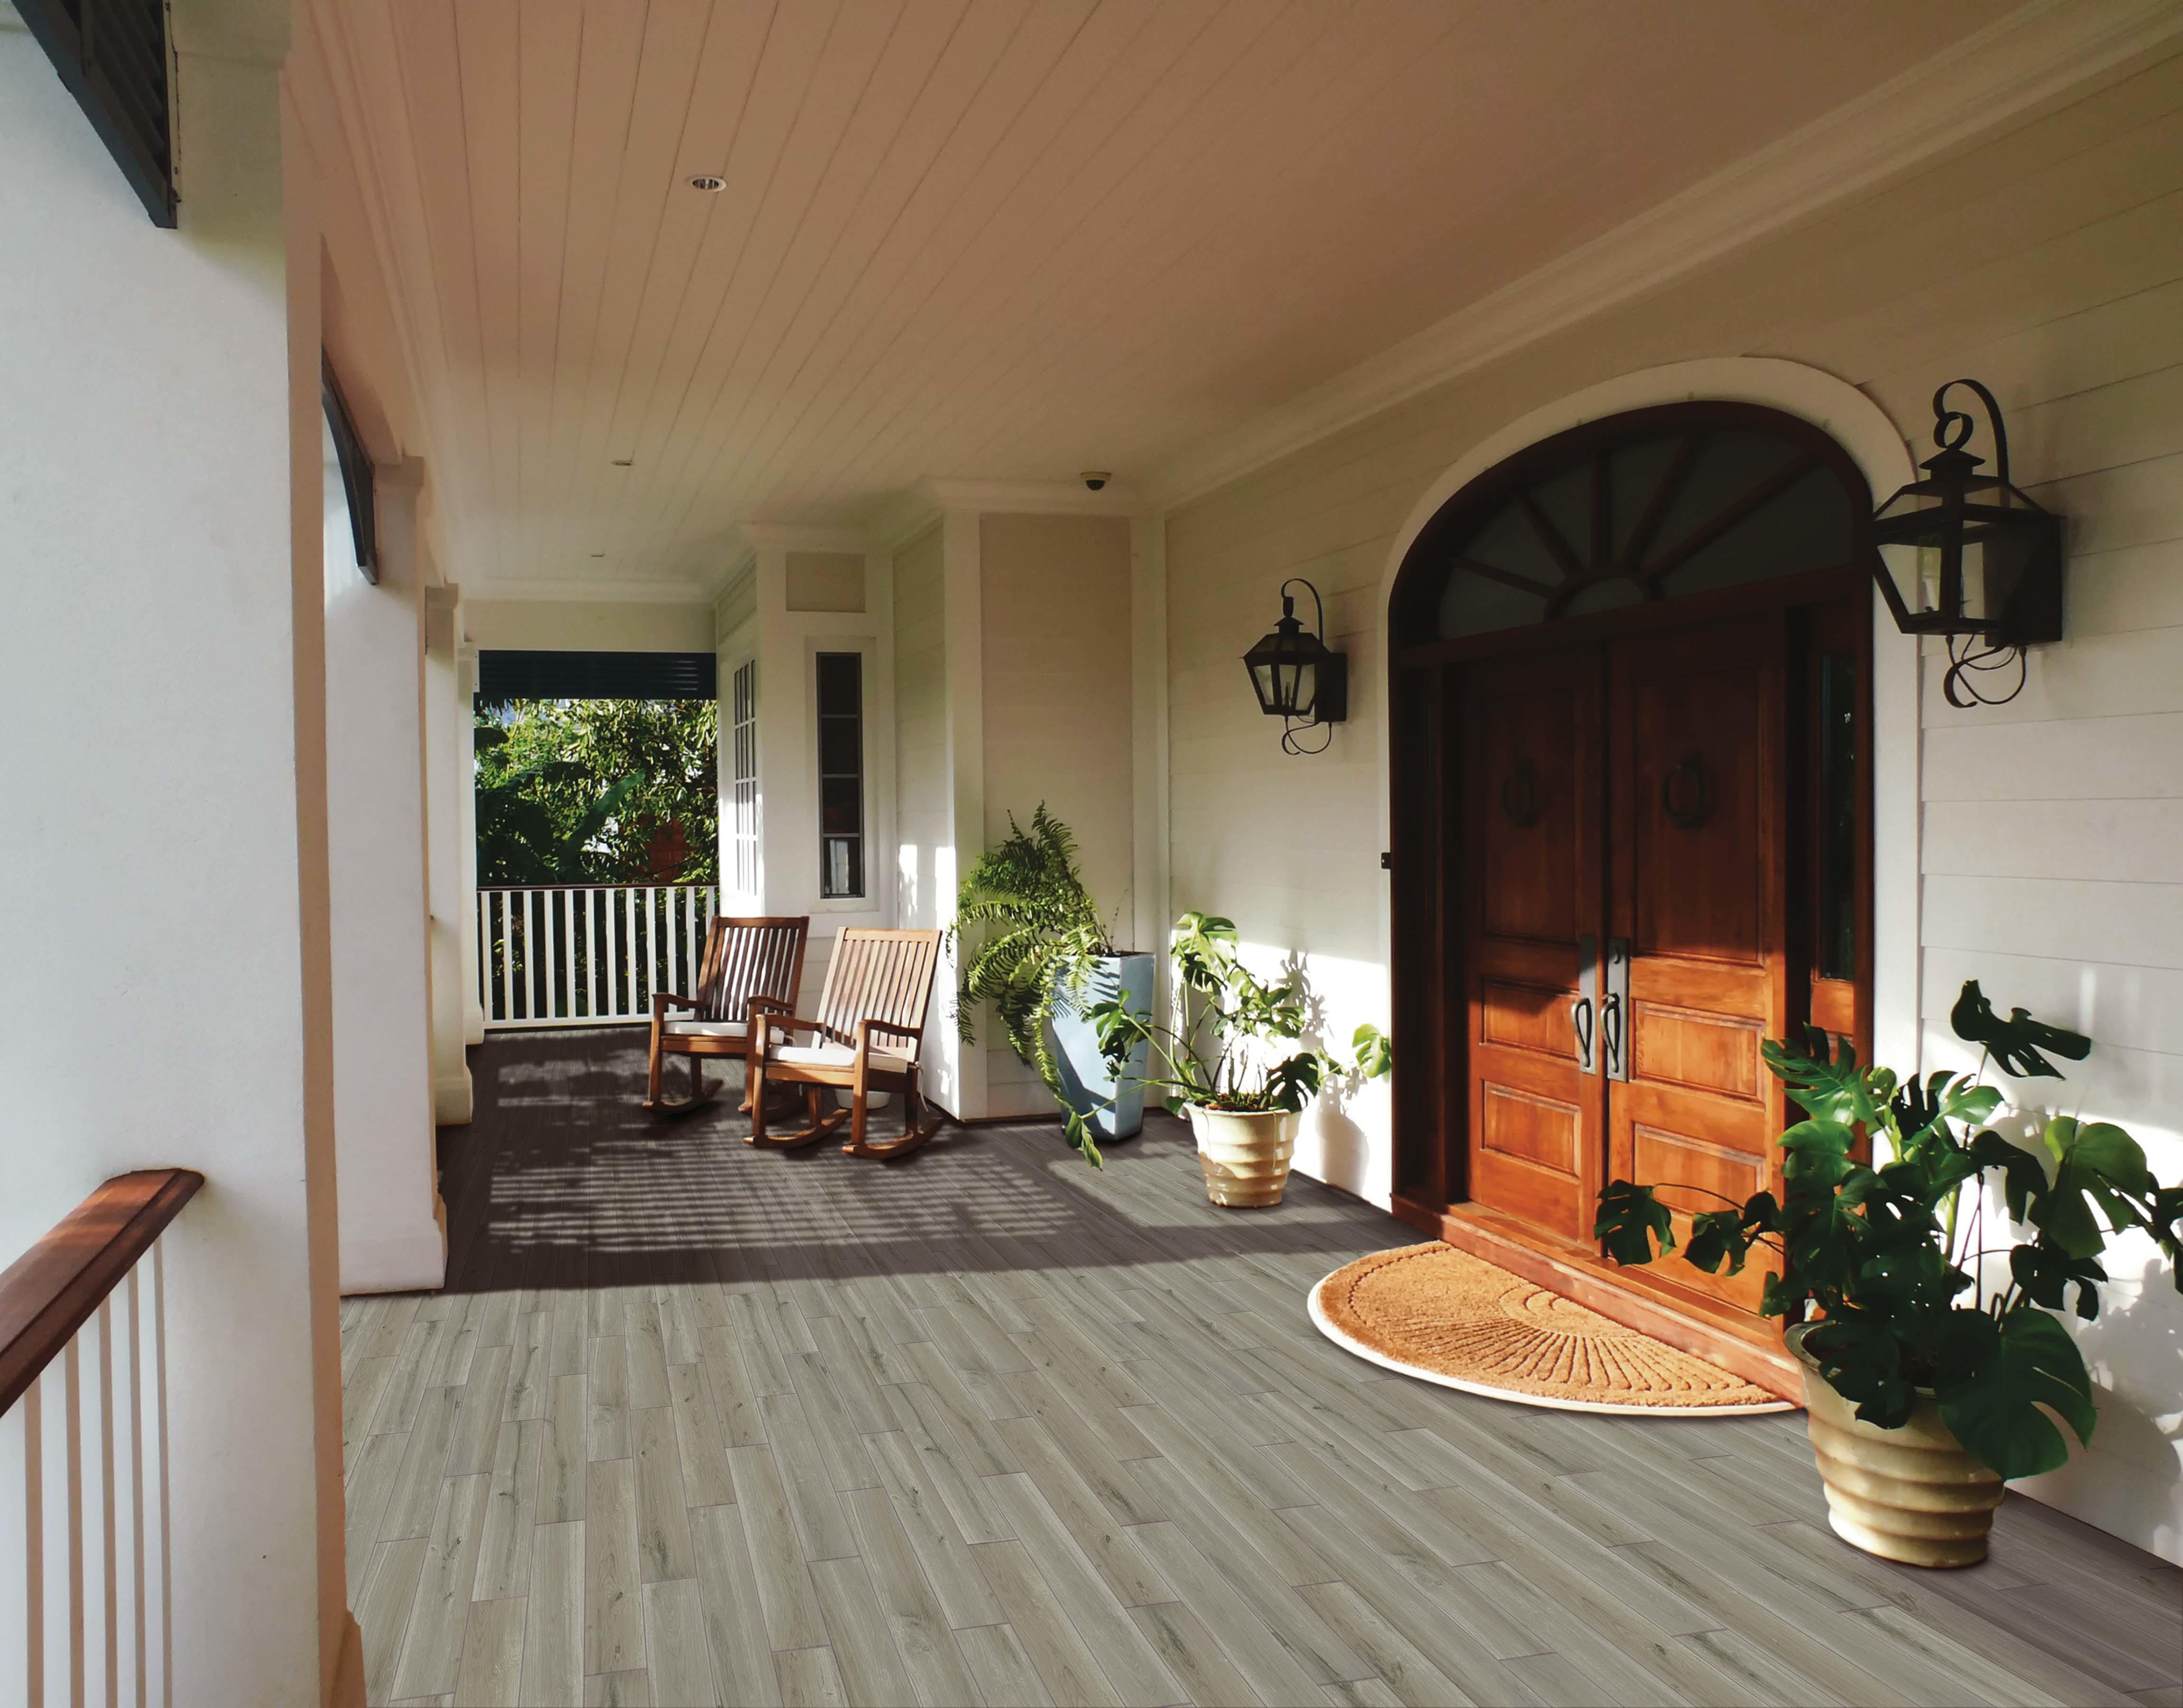 Milestone tile outlet in clarksville tn floors for Flooring clarksville tn